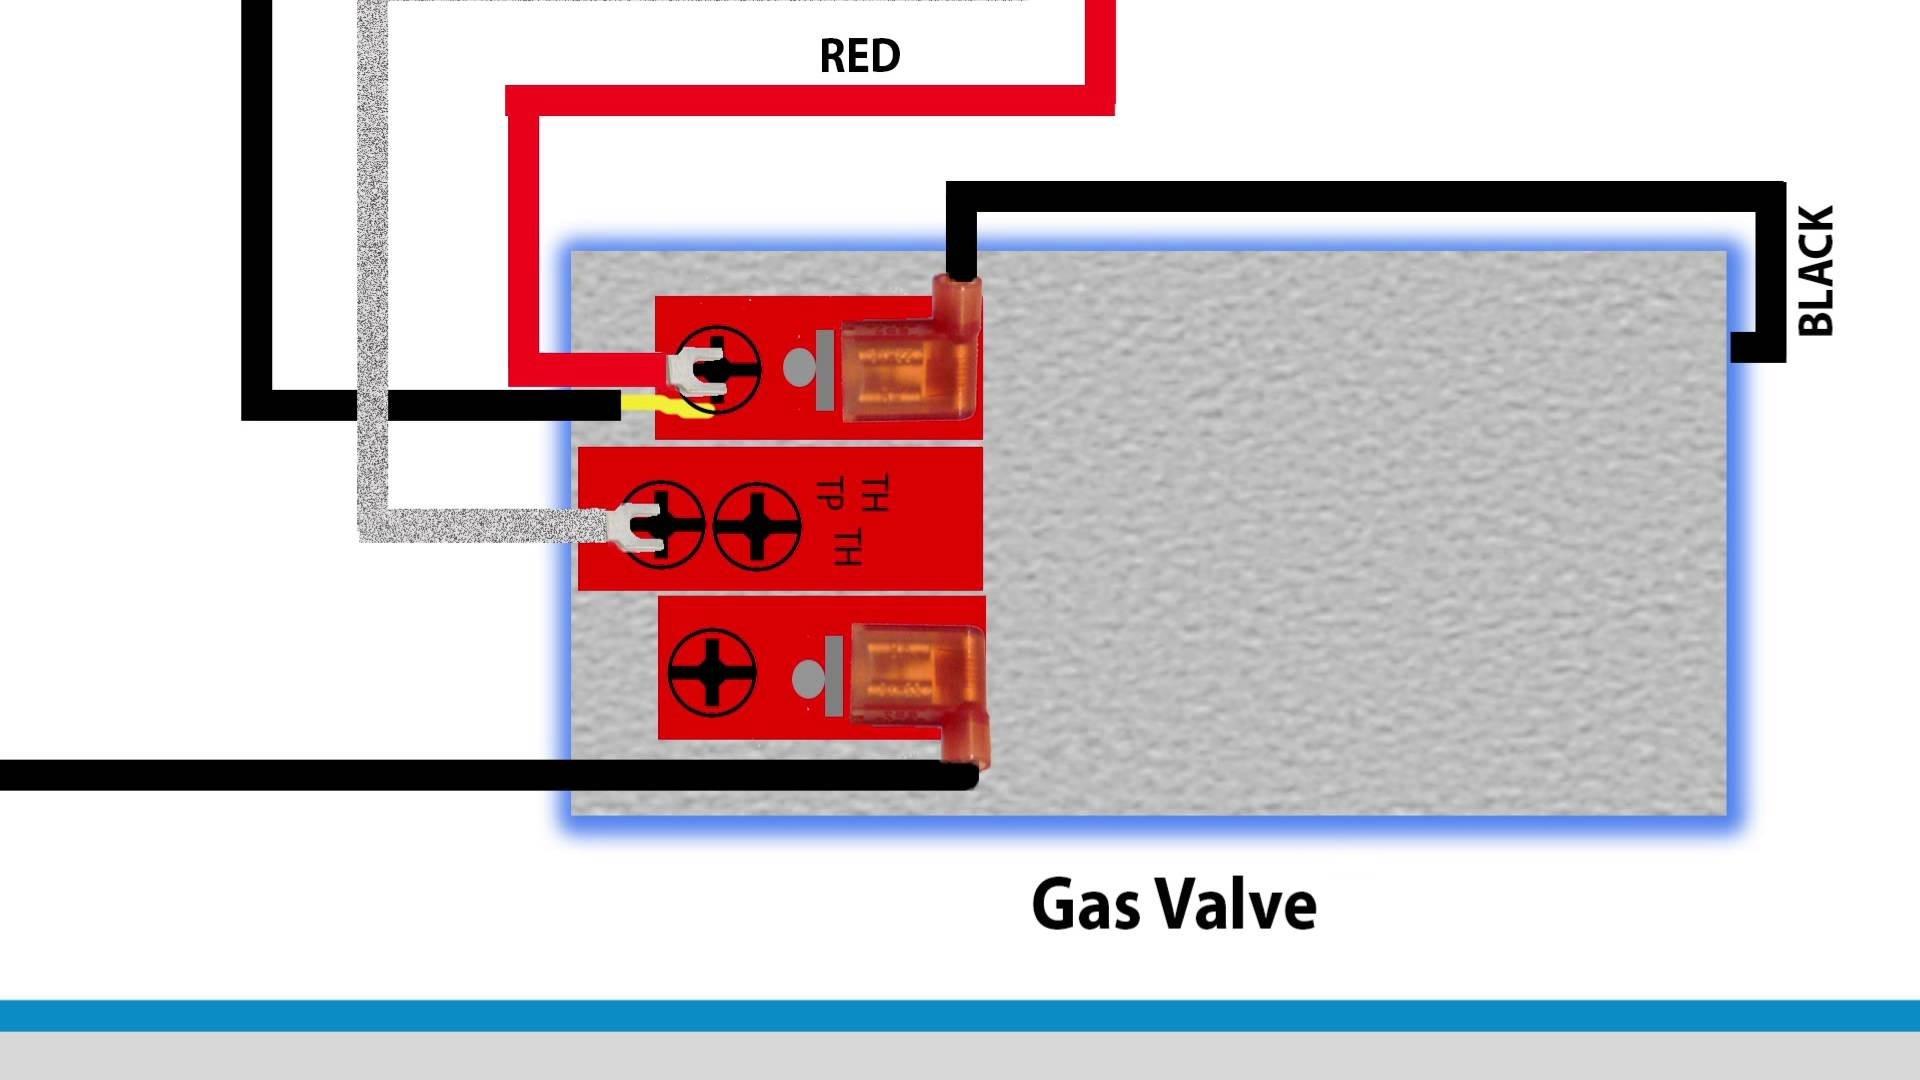 hight resolution of millivolt gas valve wiring diagram wiring diagram for furnace gas valve new gas furnace thermocouple